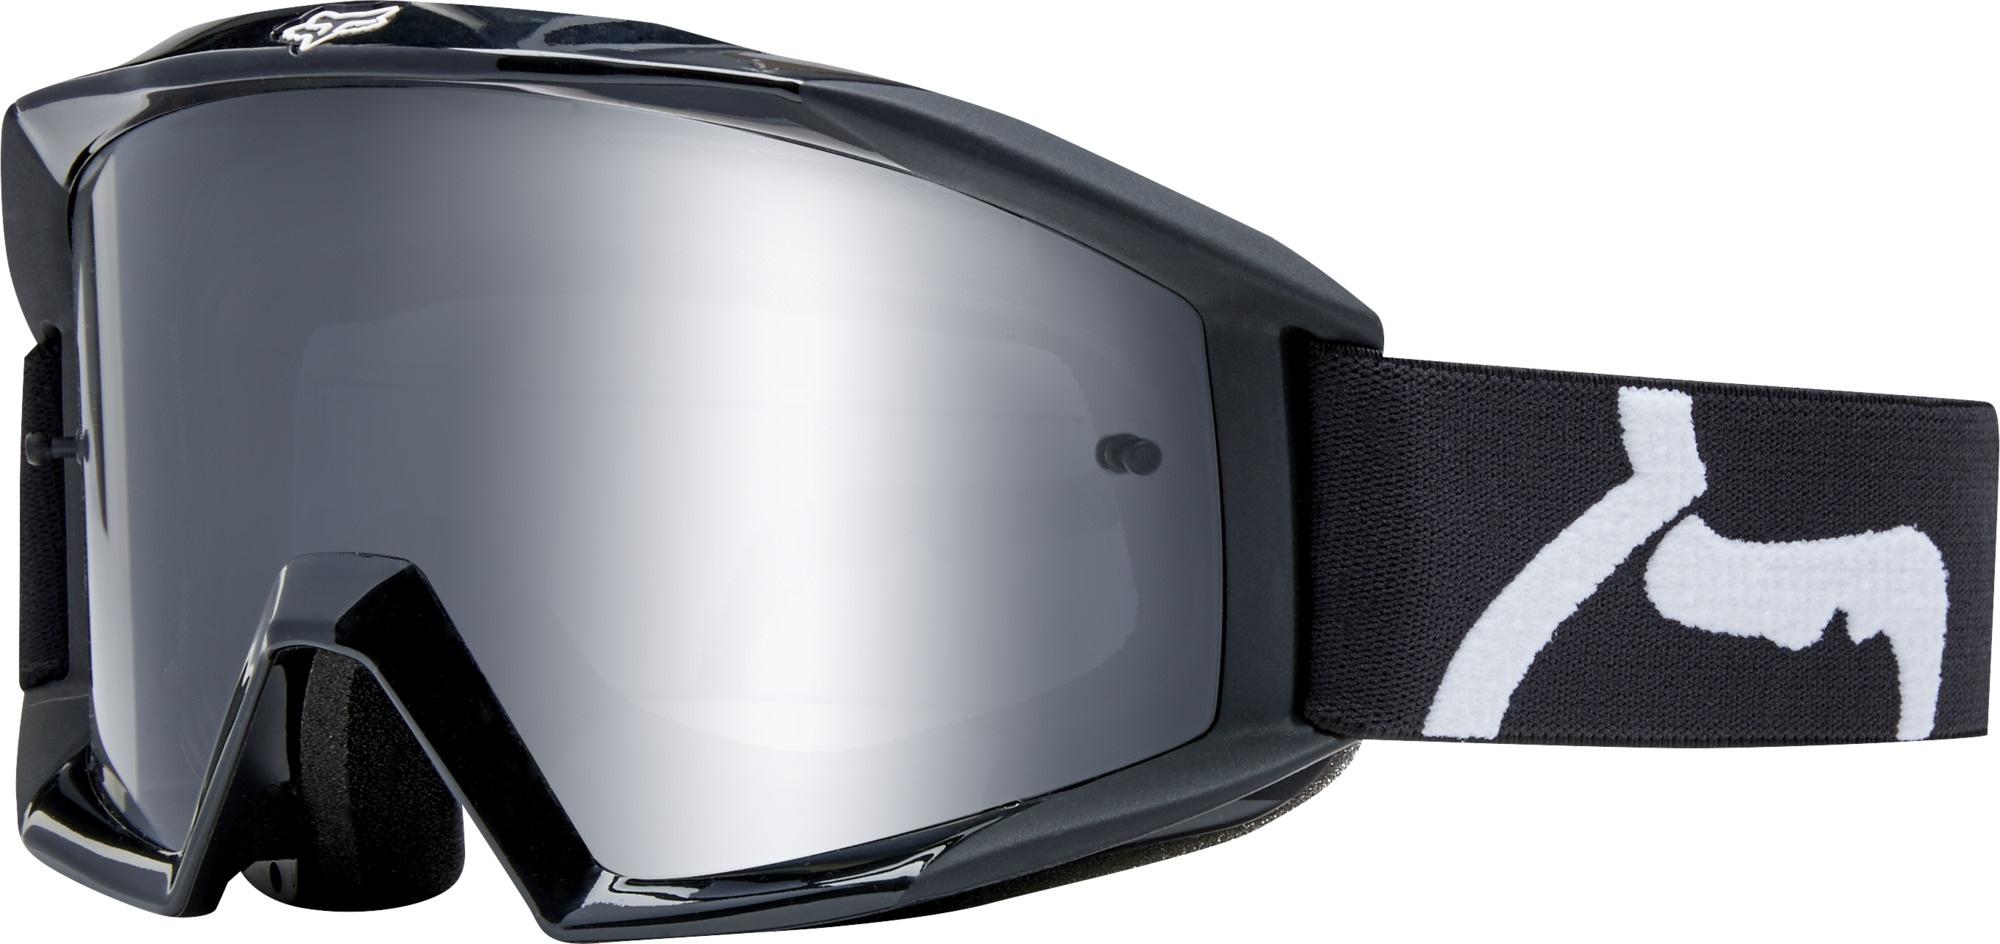 FOX Main Sand Goggle  -NS, Black MX19